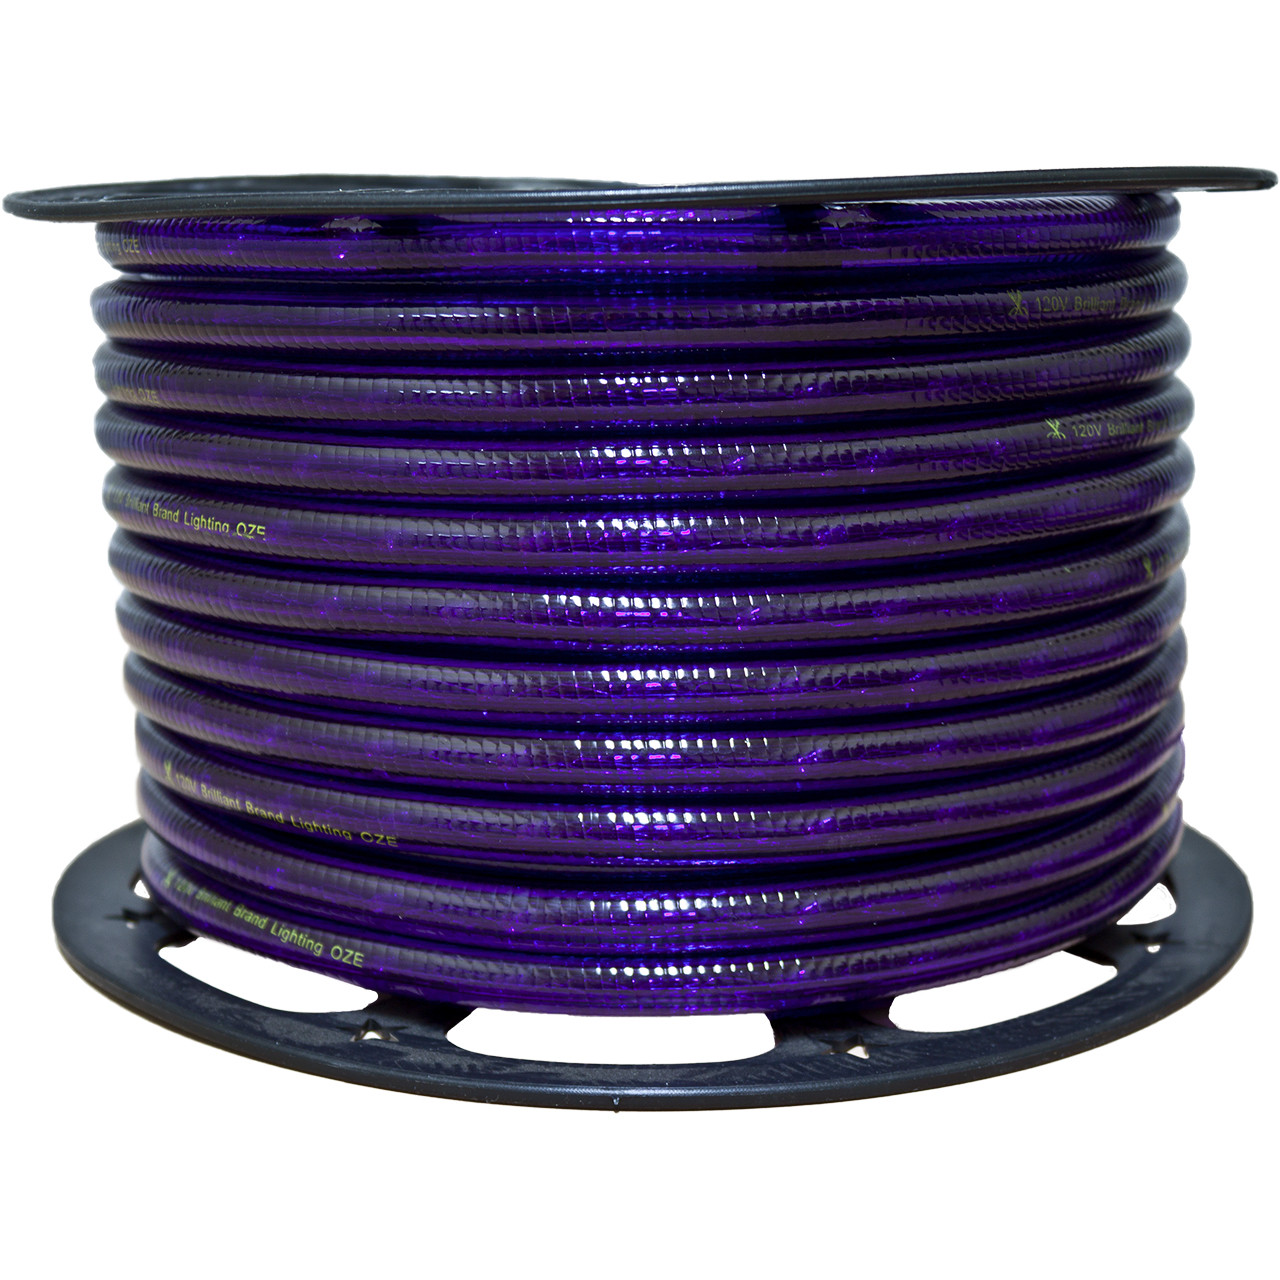 Purple Incandescent Rope Light - 120 Volt 3 8 150 Feet Birddog Lighting